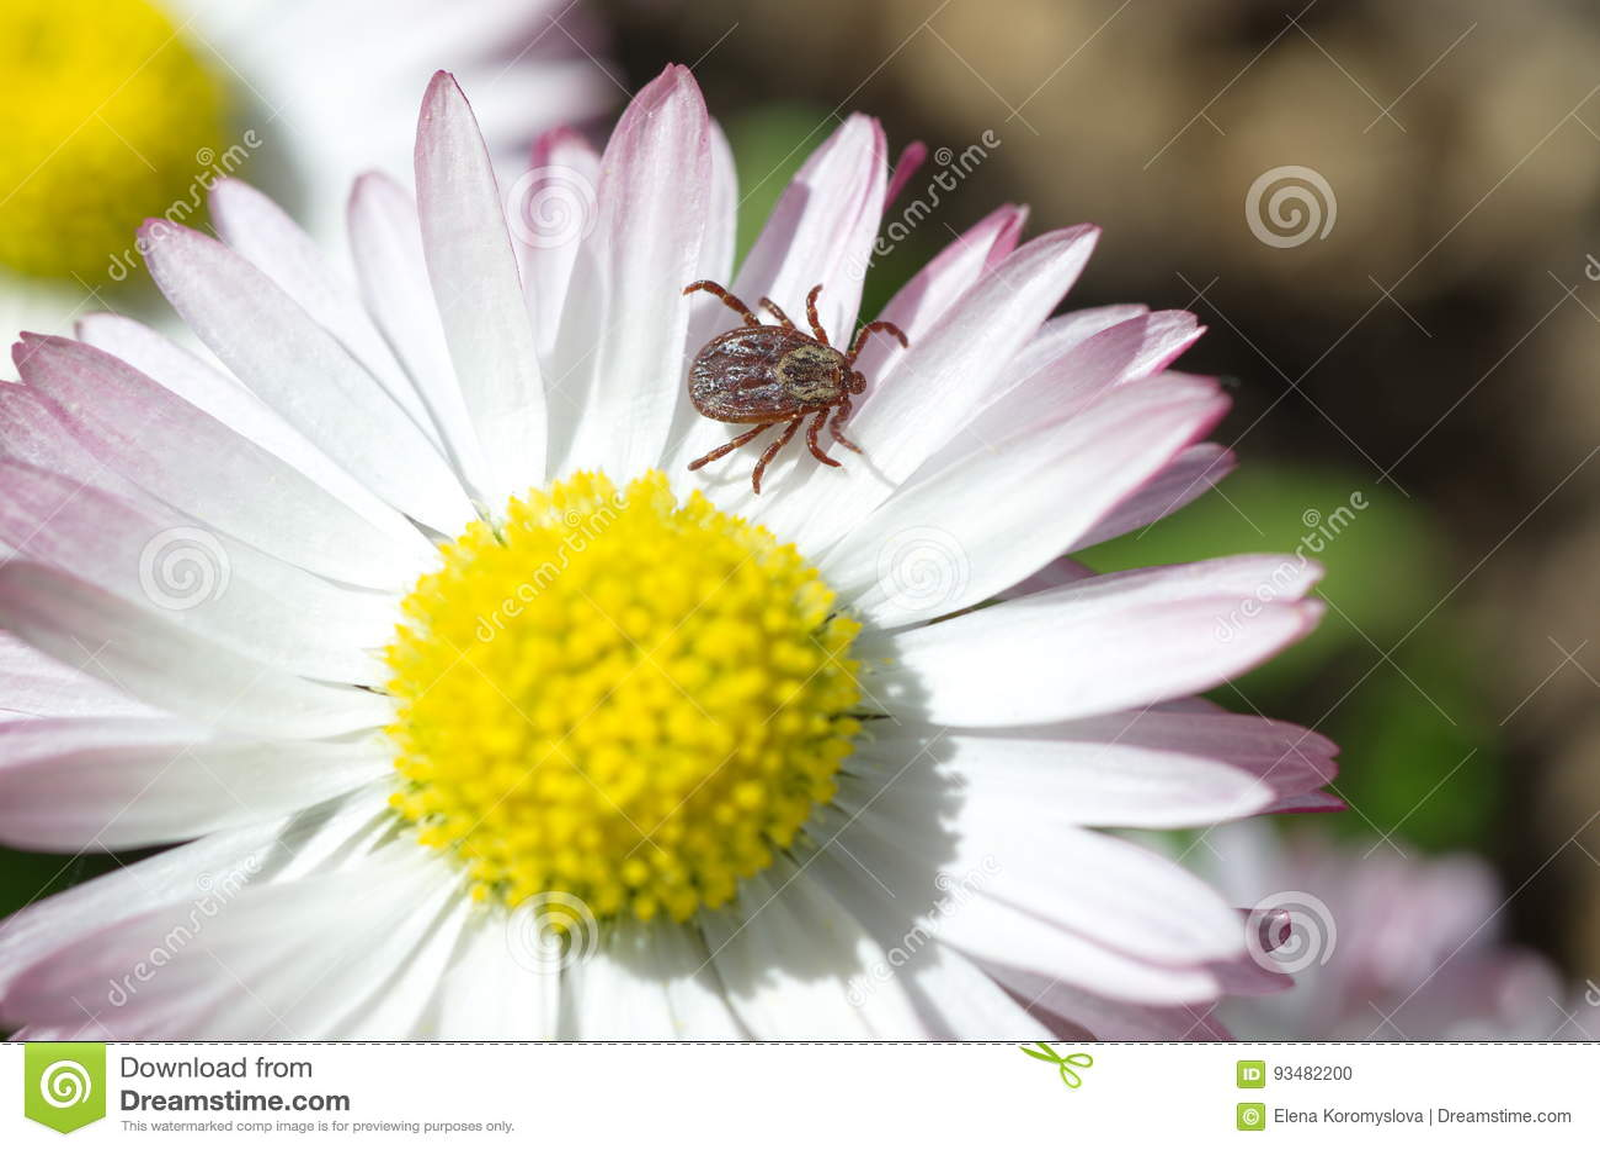 Tick Lat Acarina On A Daisy Flower Stock Photo Image Of